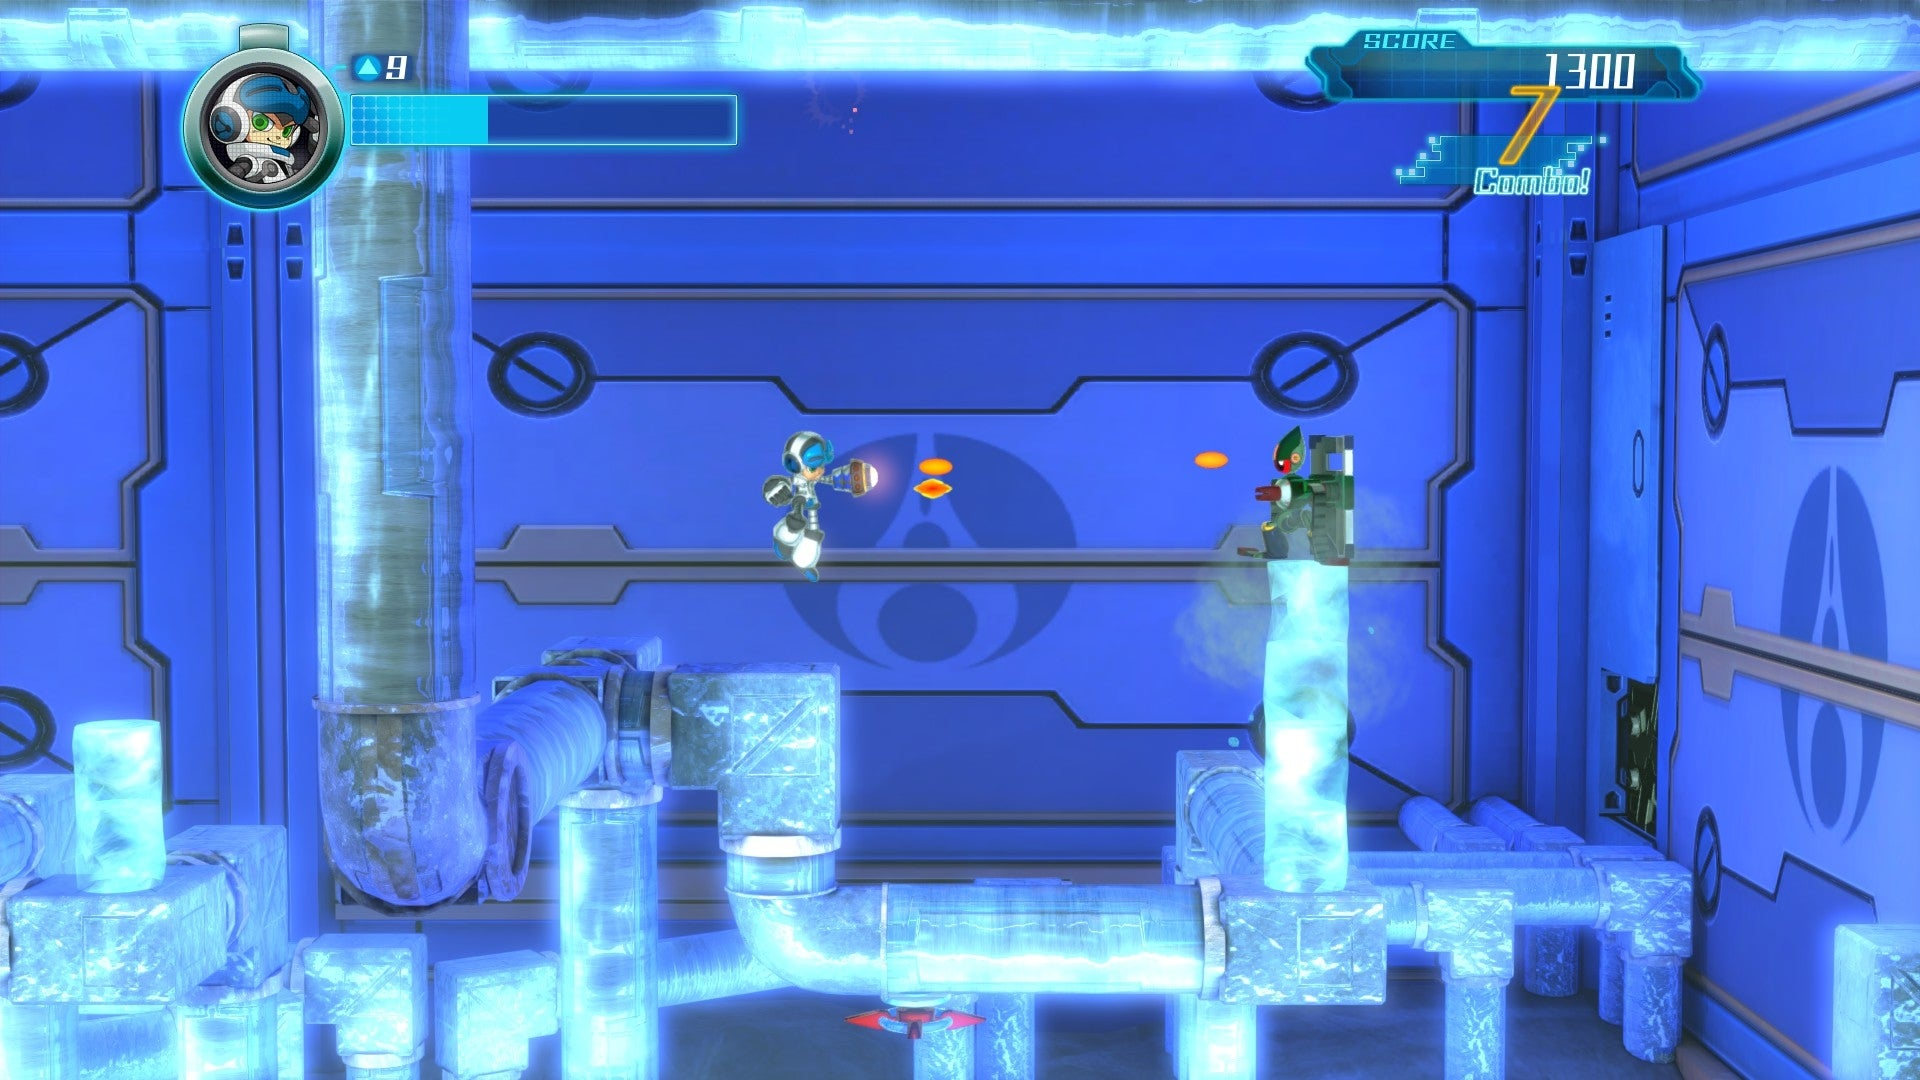 Mega Man's Spiritual Successor Arrives September 15